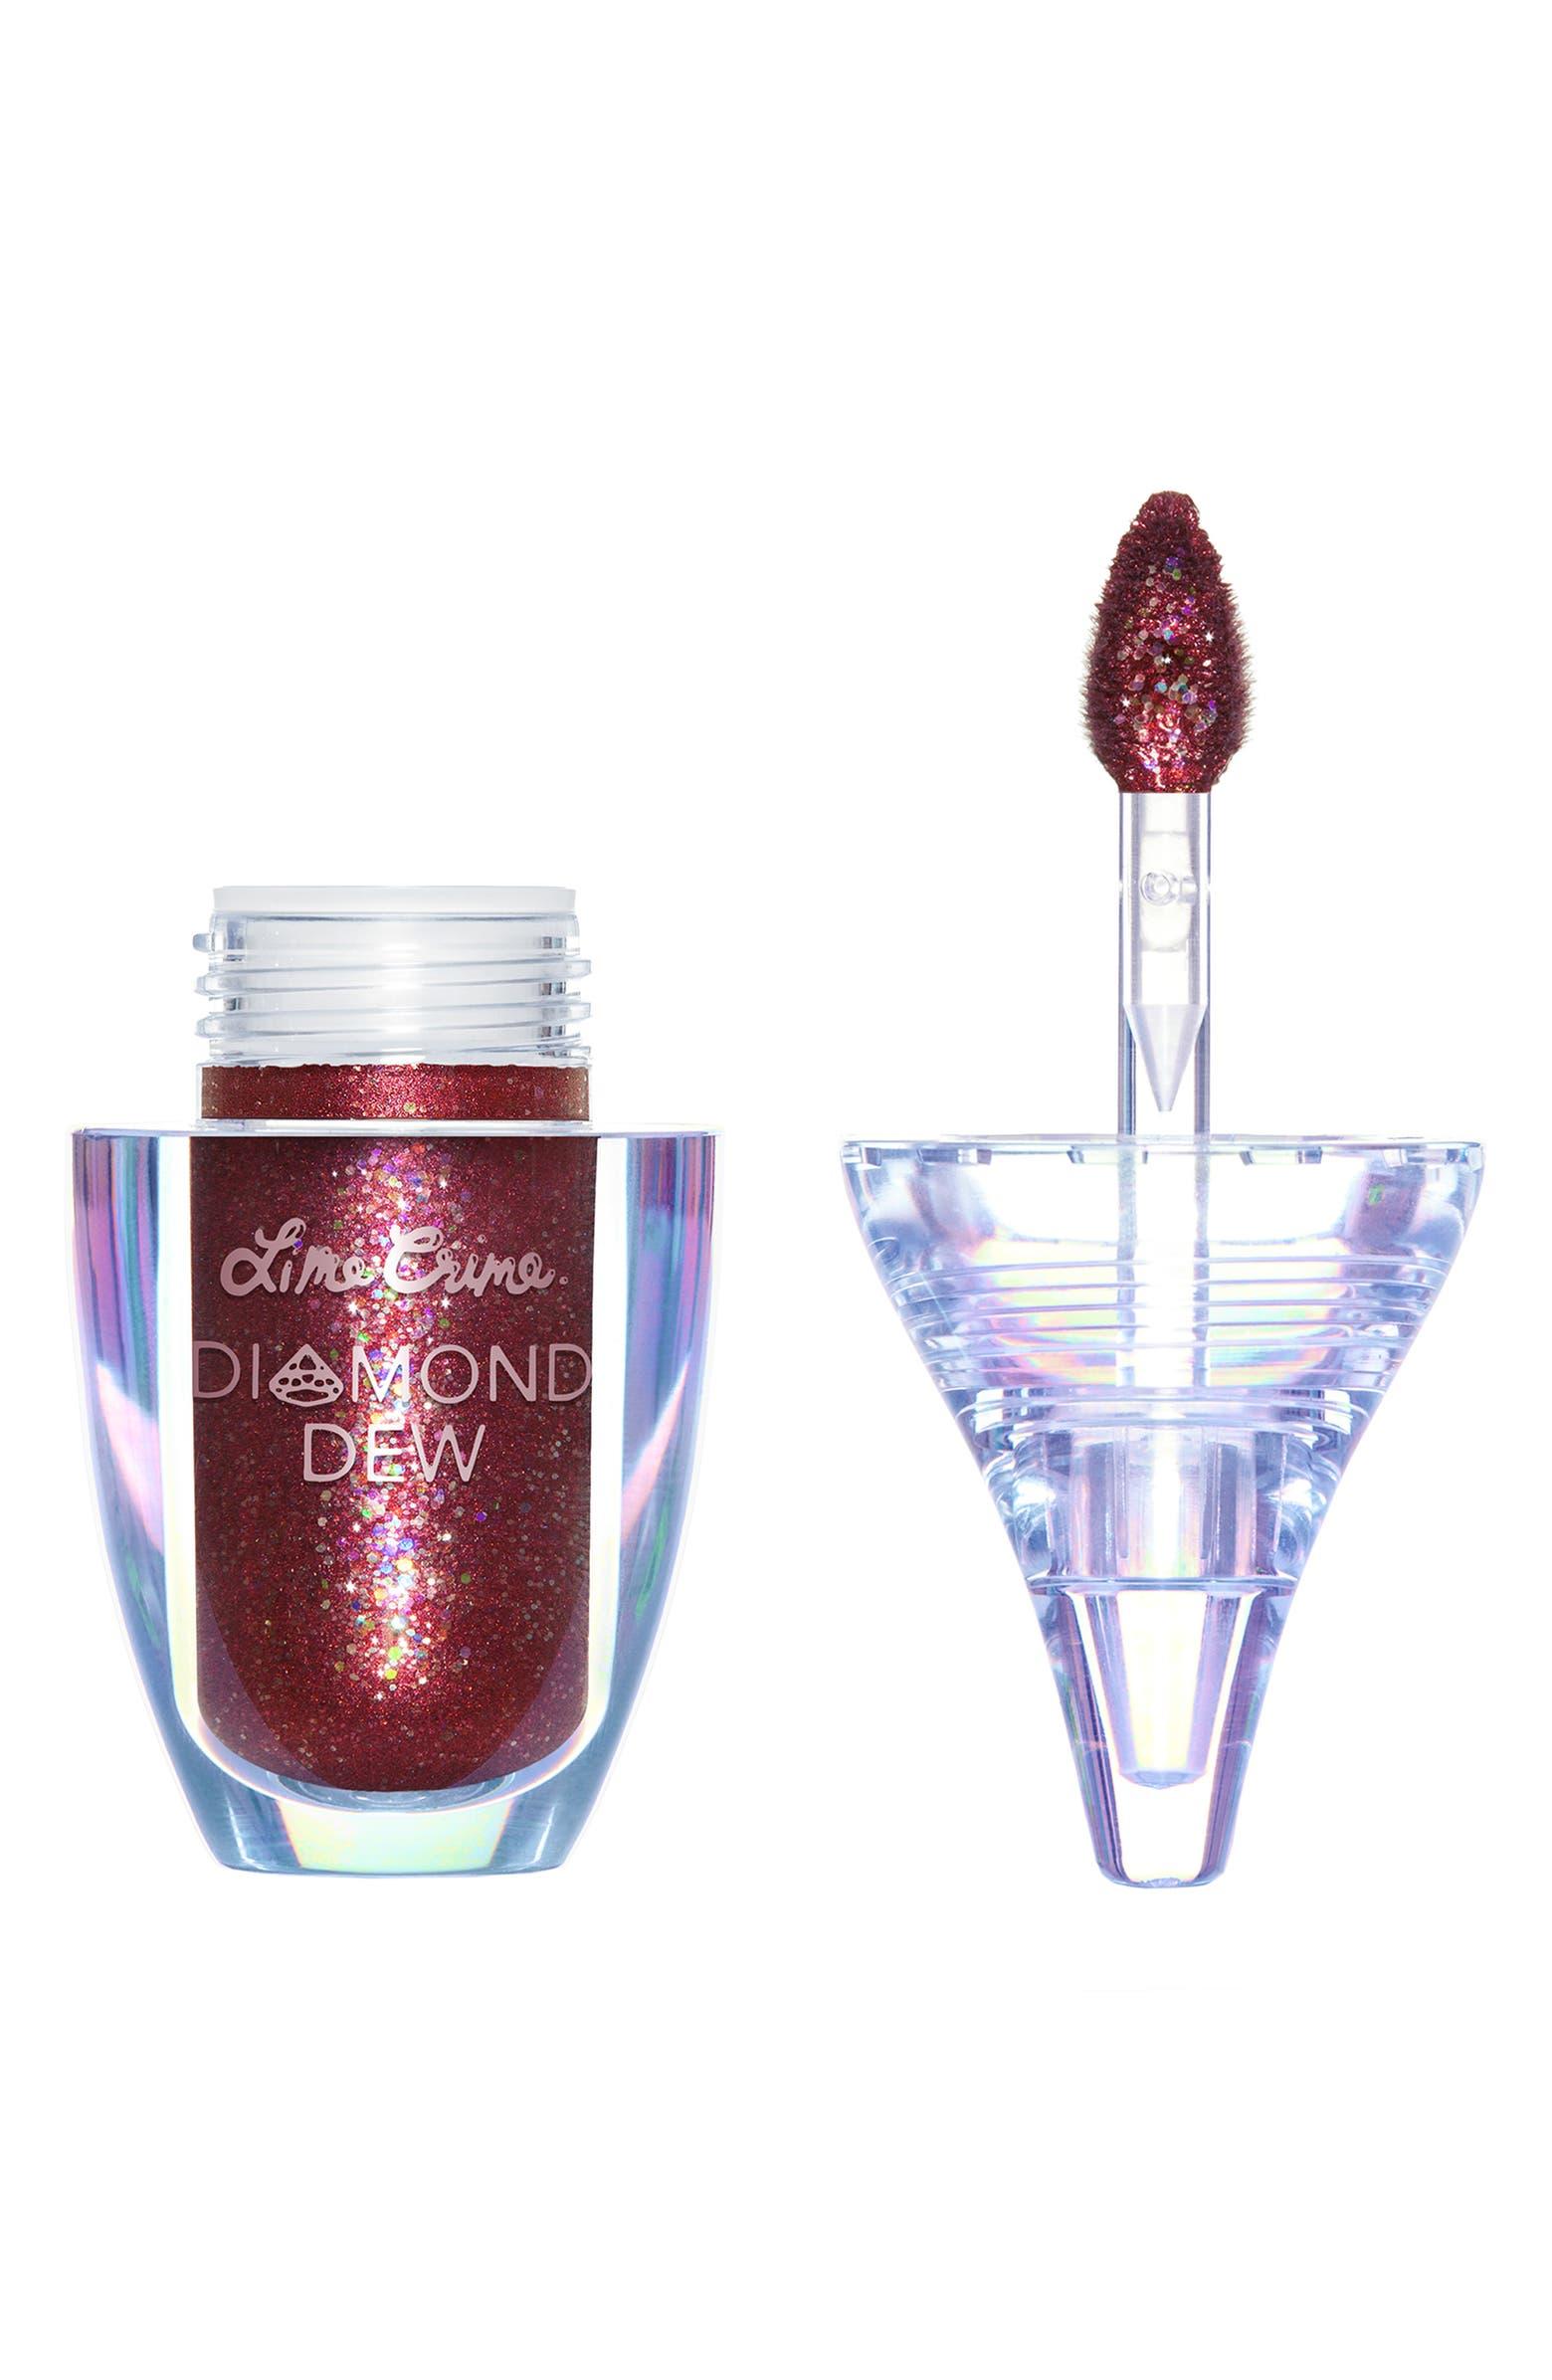 Diamond Dew Glitter Liquid Eyeshadow LIME CRIME